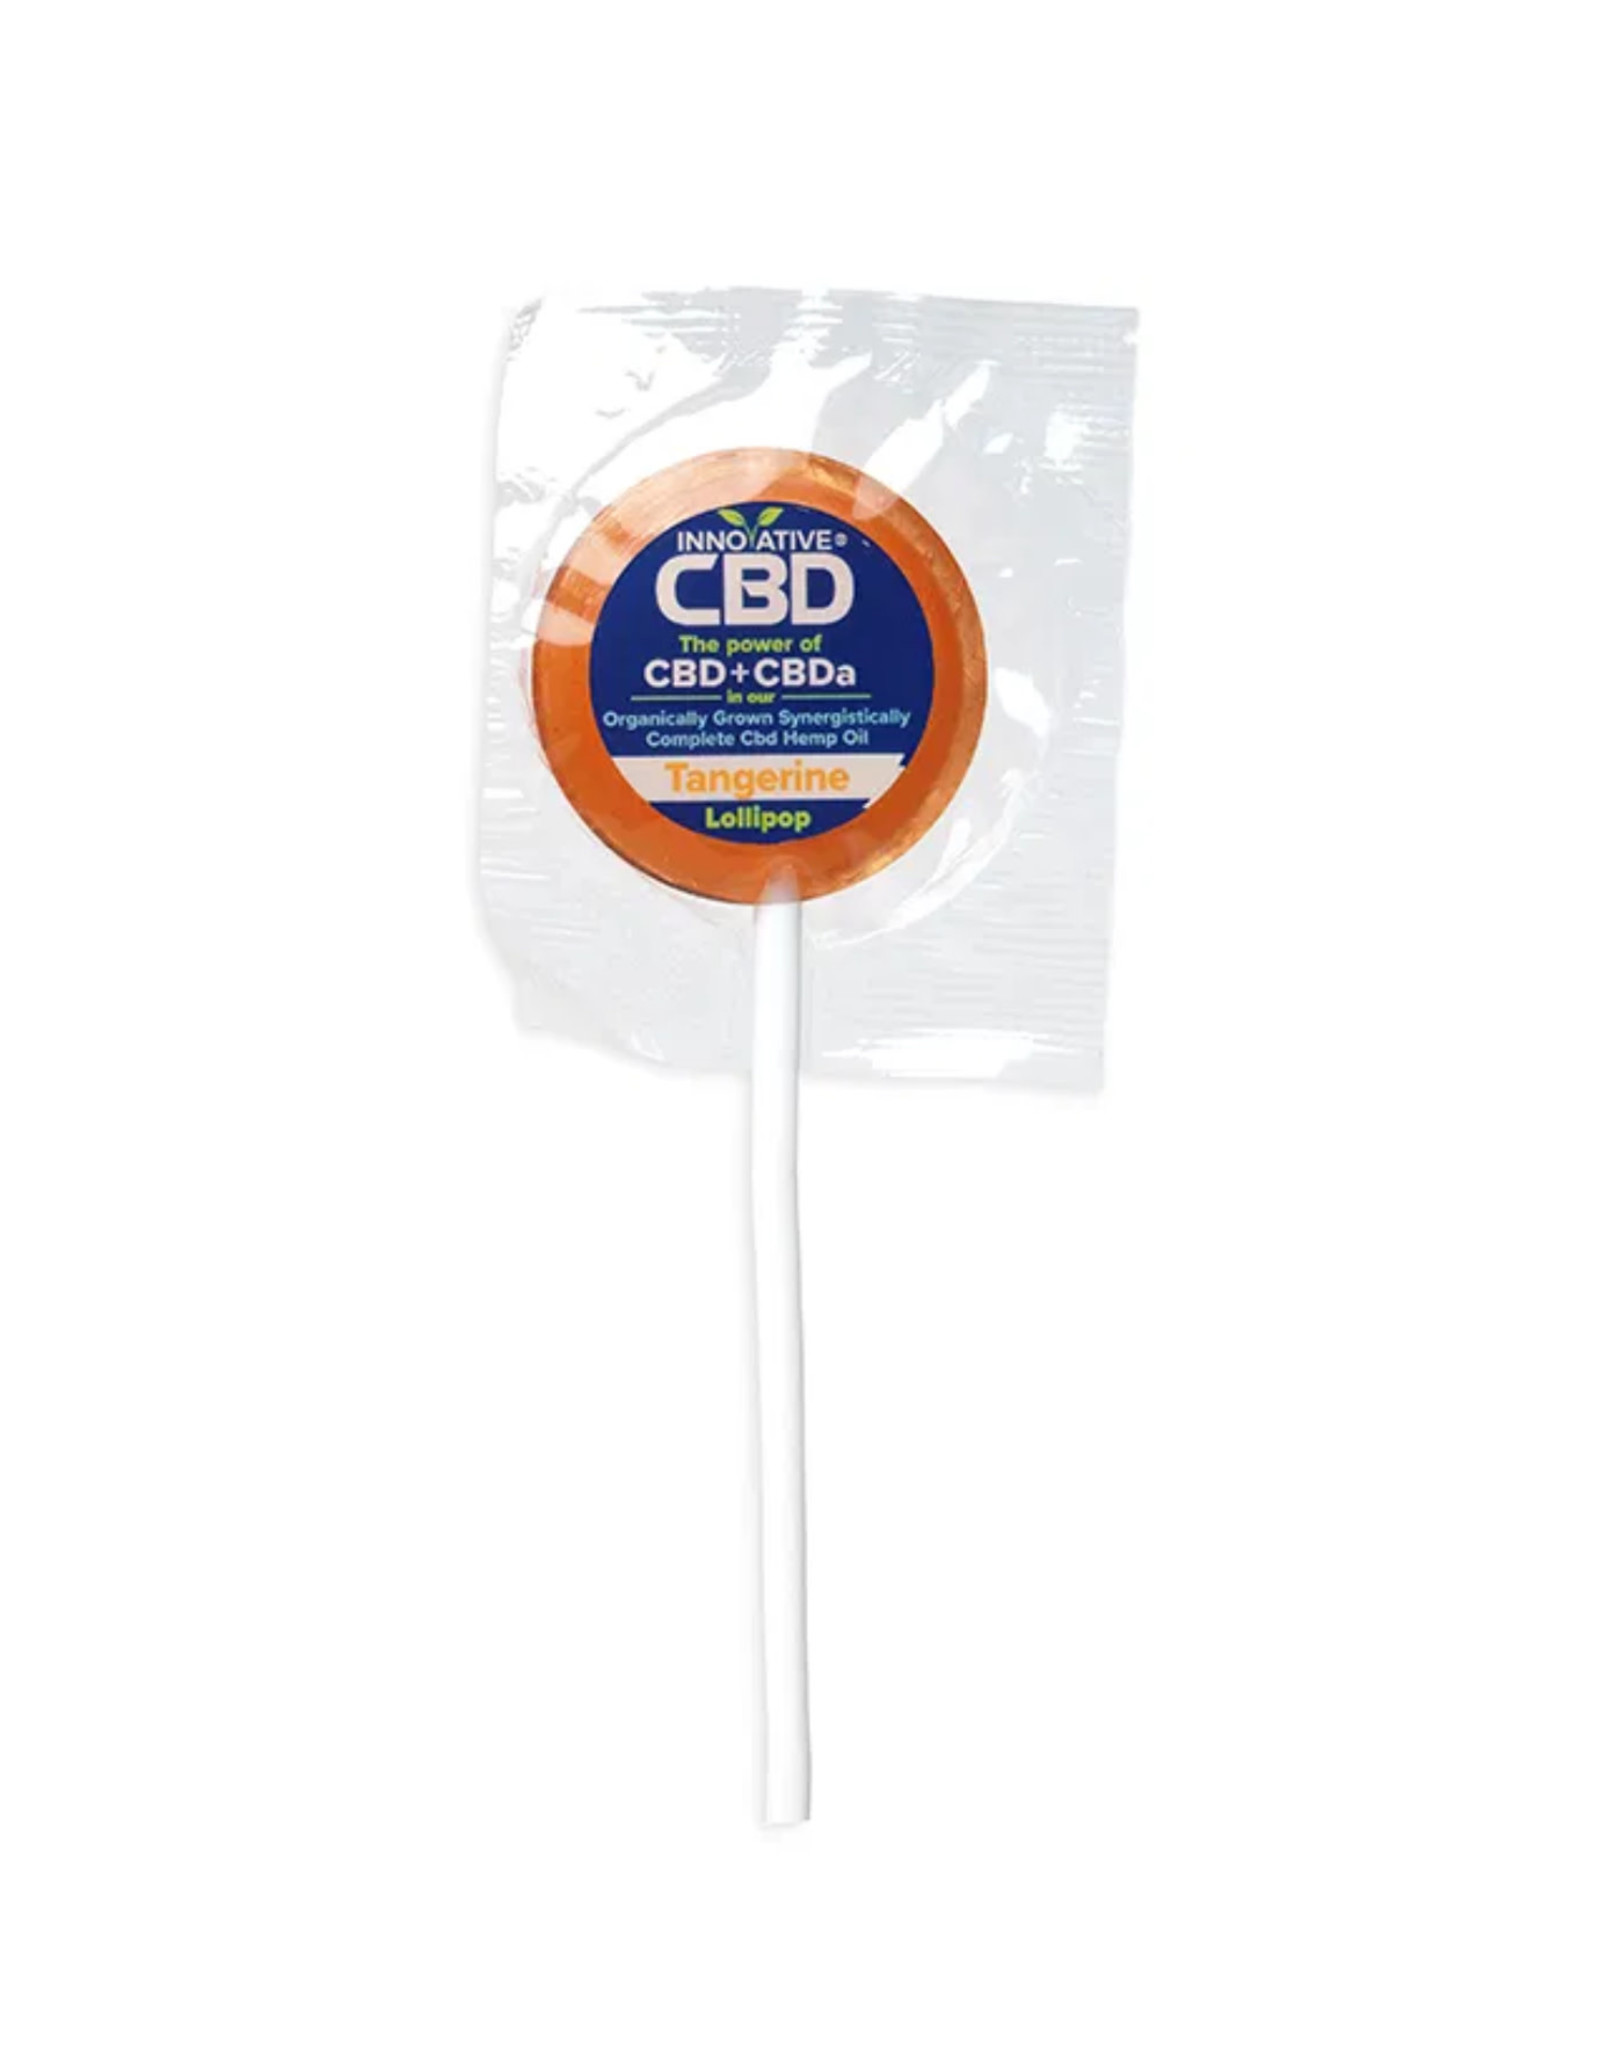 Innovative CBD 3mg CBD Tangerine Lollipop